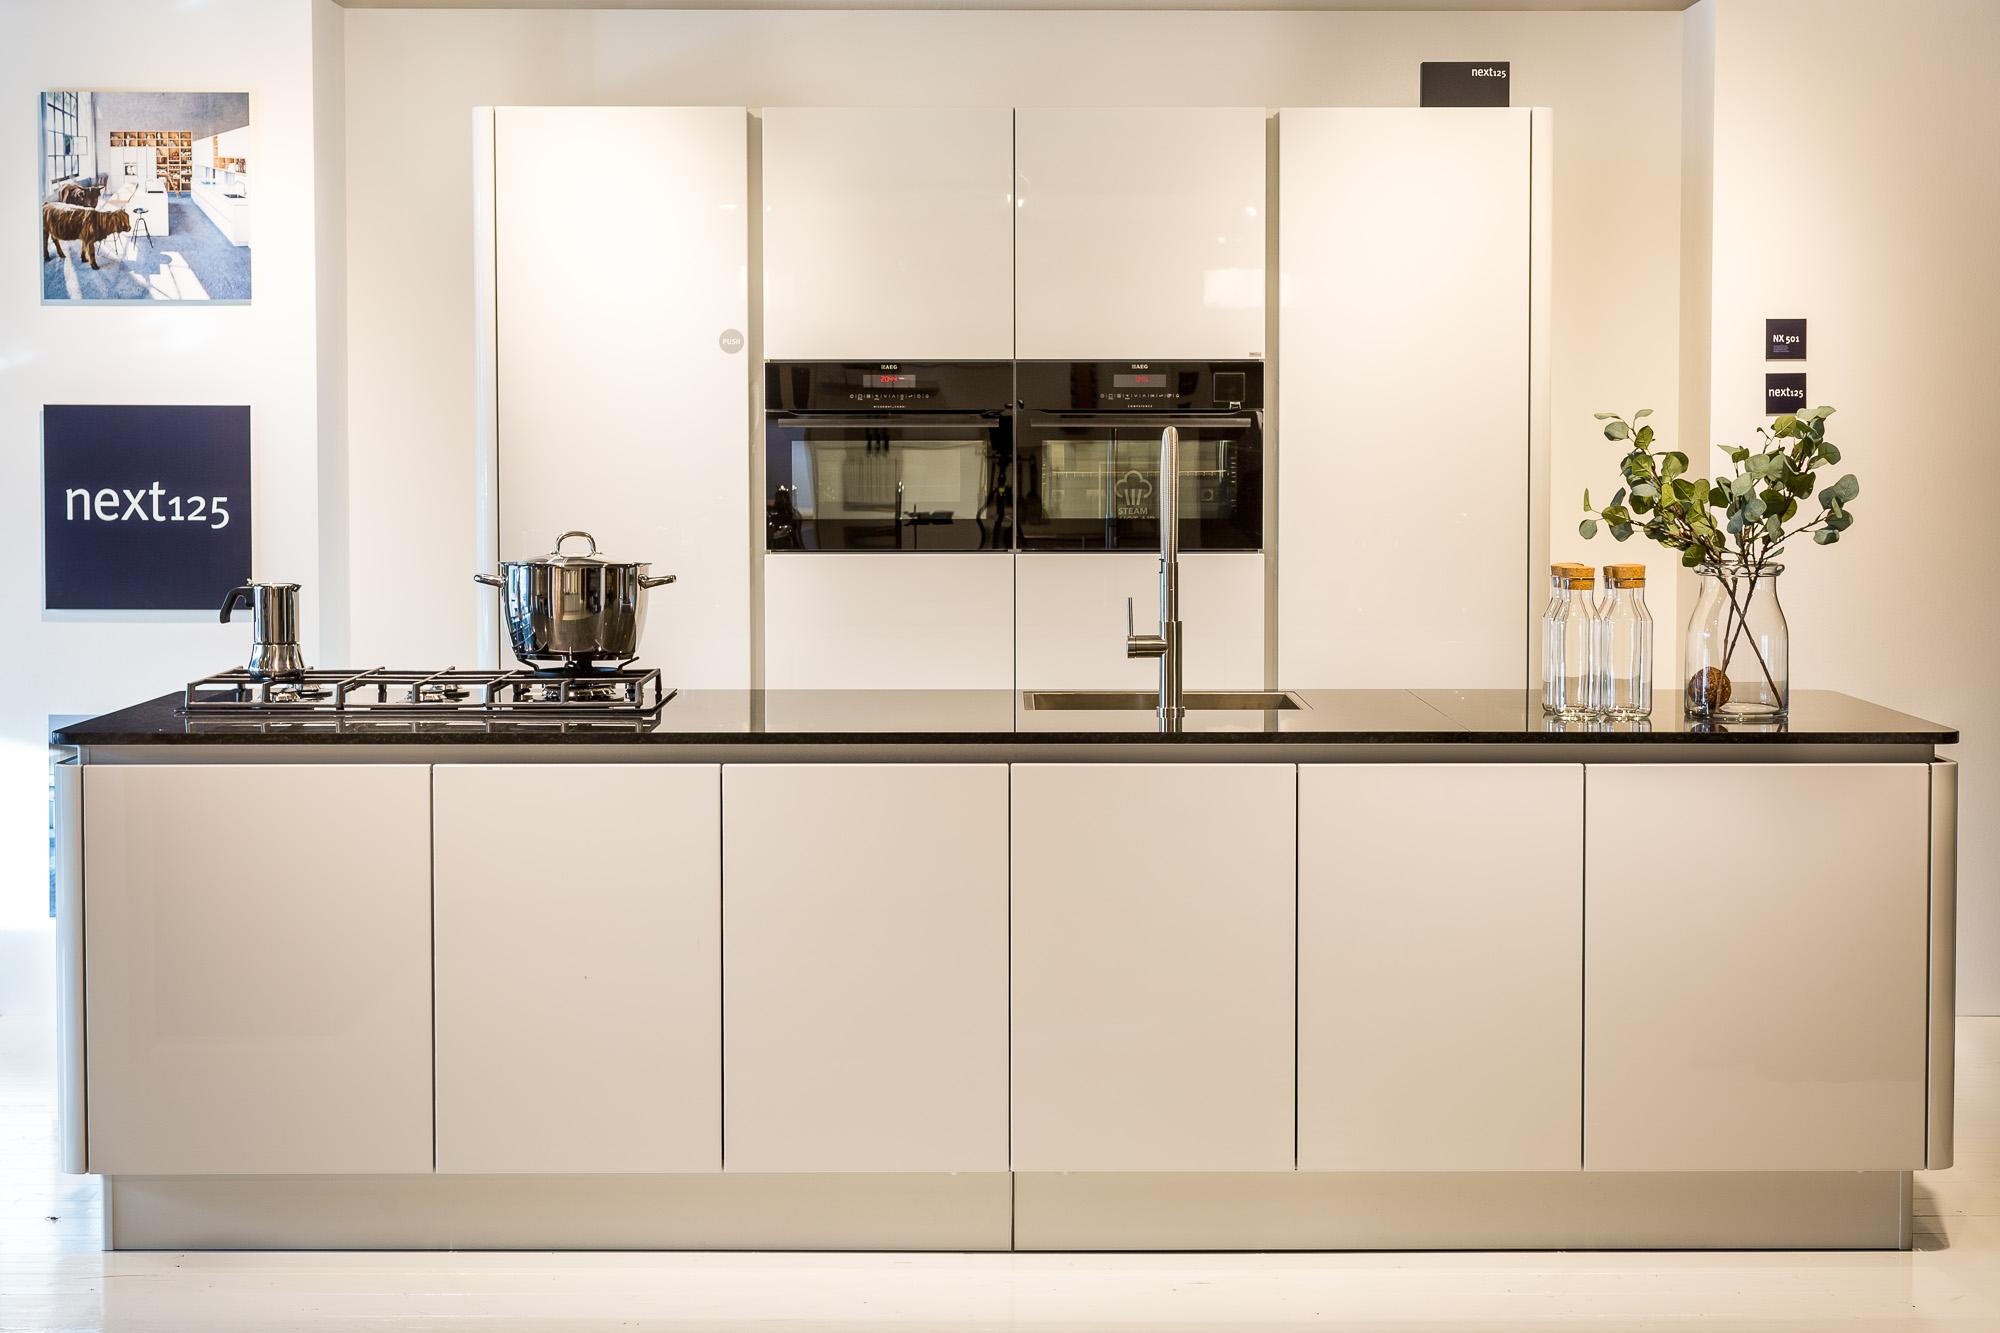 Moderne Greeploze Keuken : Concordia keuken bad keukens moderne greeploze keuken